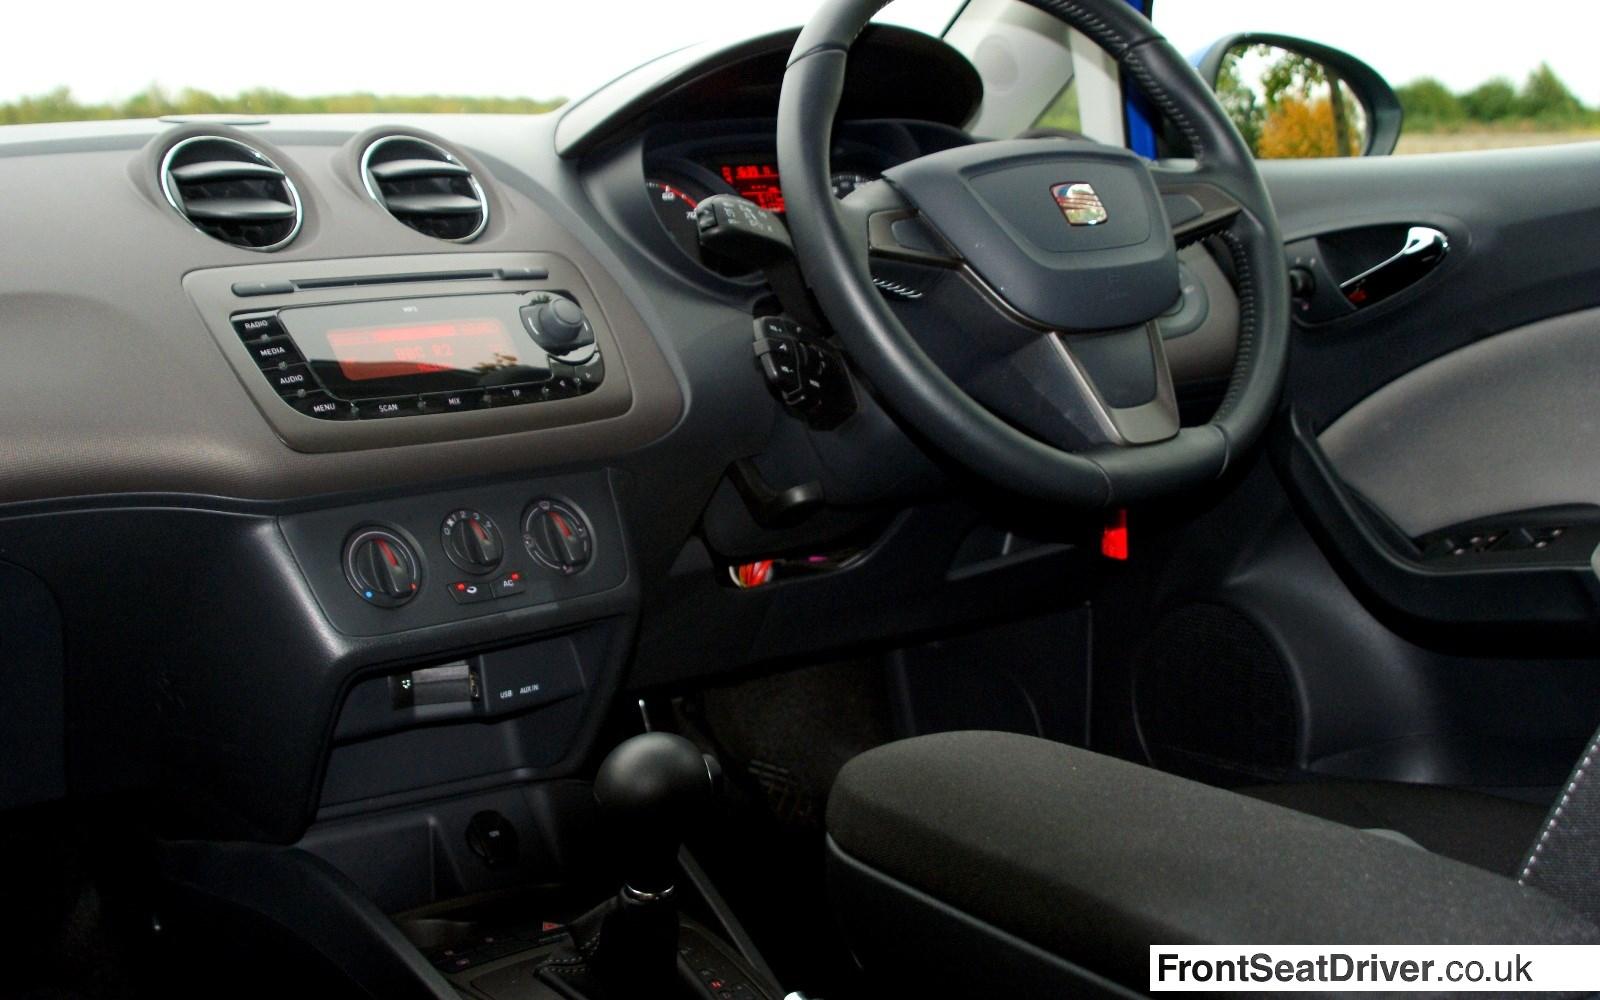 Seat Ibiza 2013 Interior Front Seat Driver